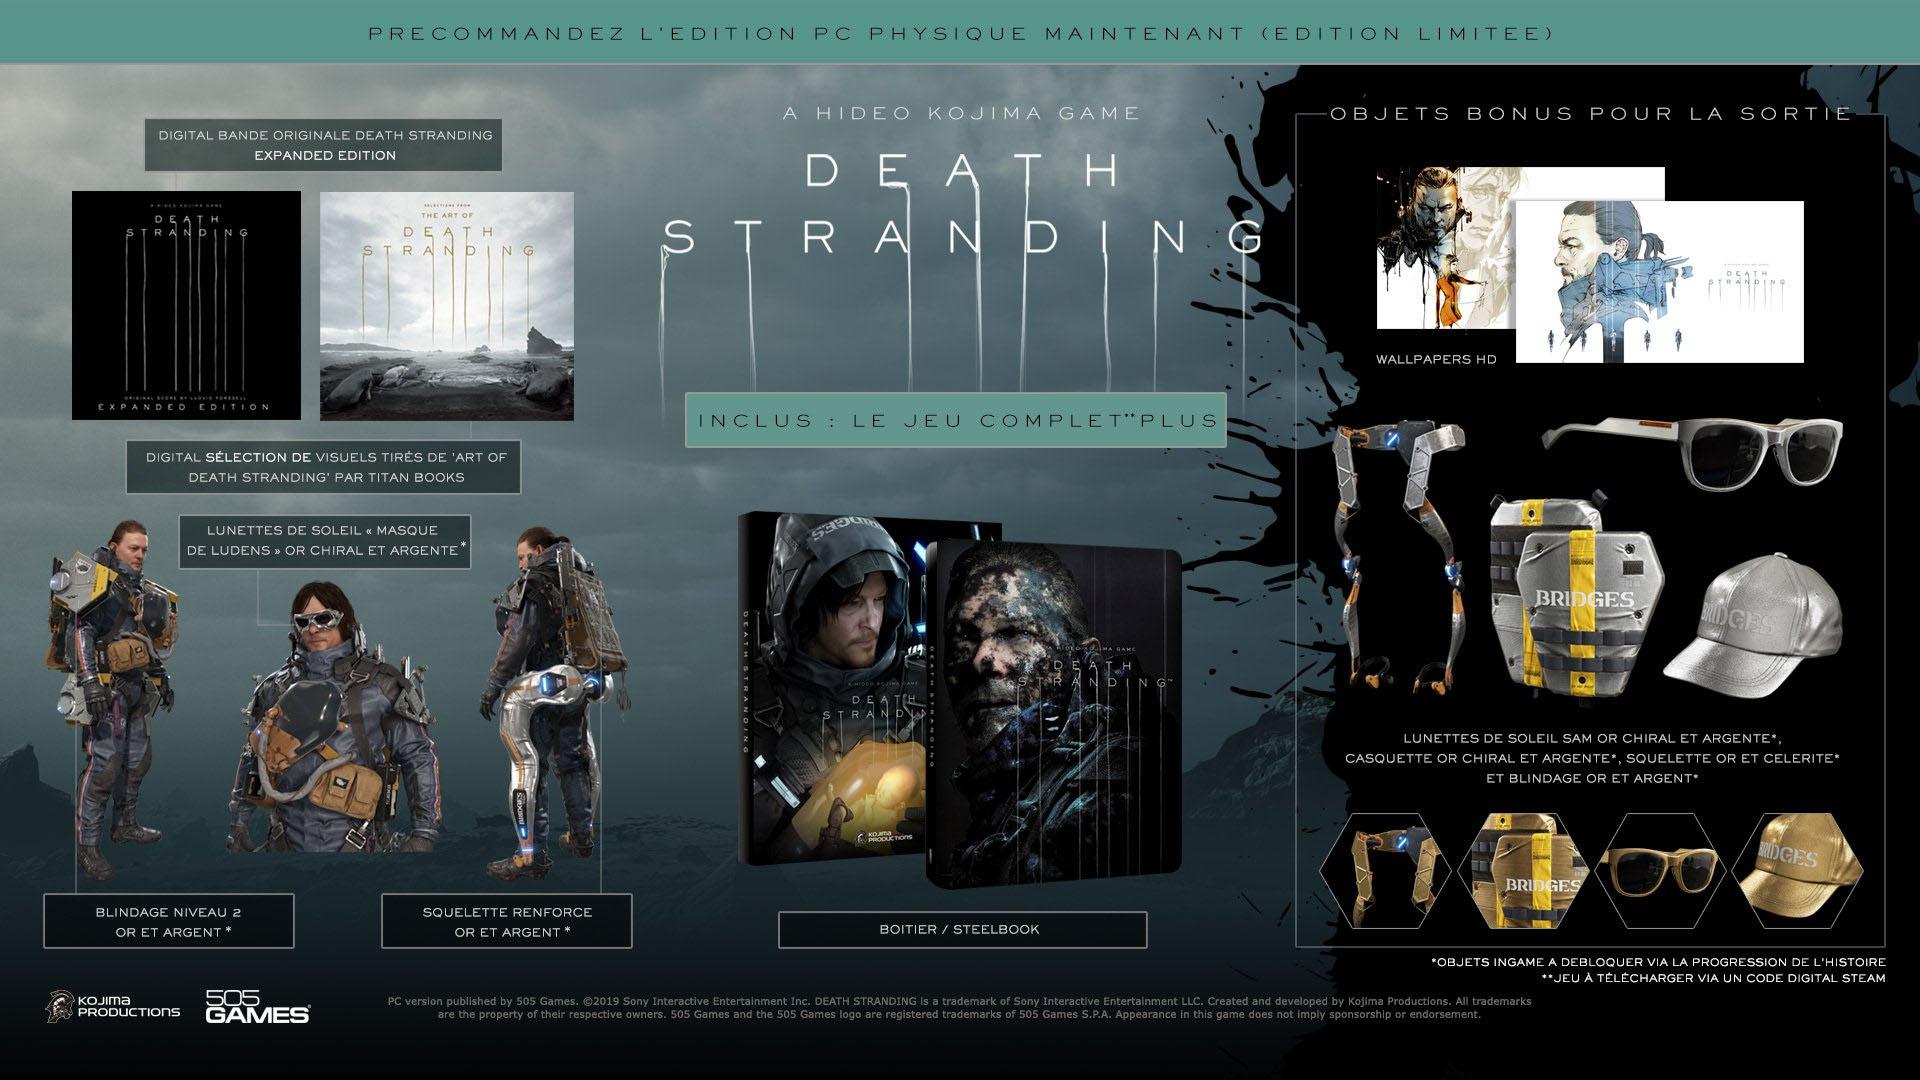 Death Stranding Edition Limitee PC detail